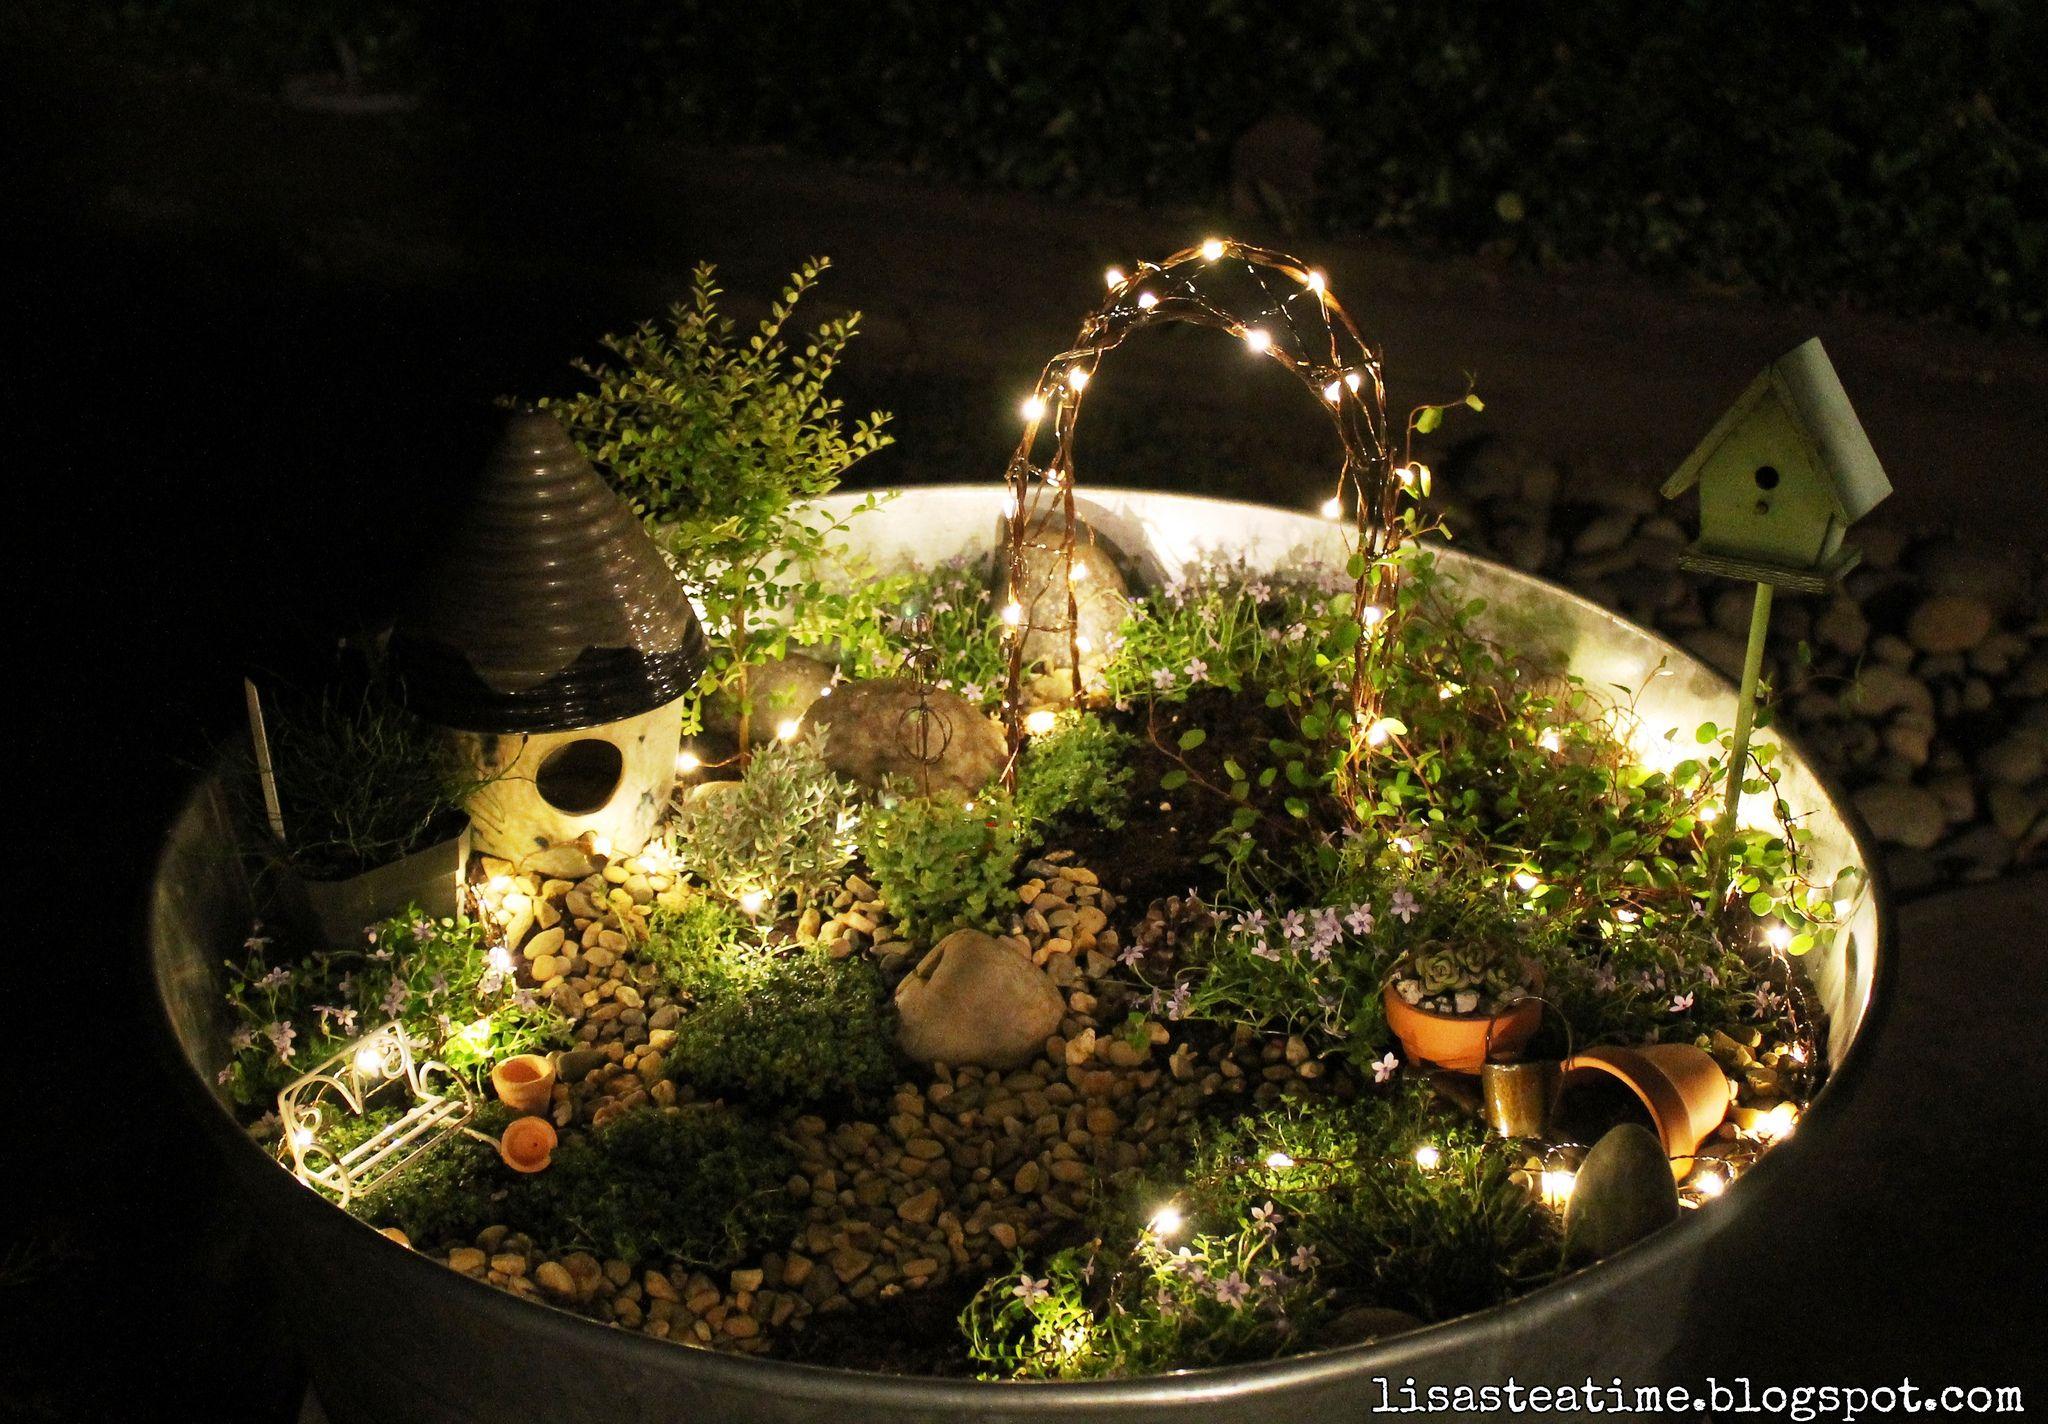 Fairy Garden at night | Fairy, Gardens and Miniature gardens